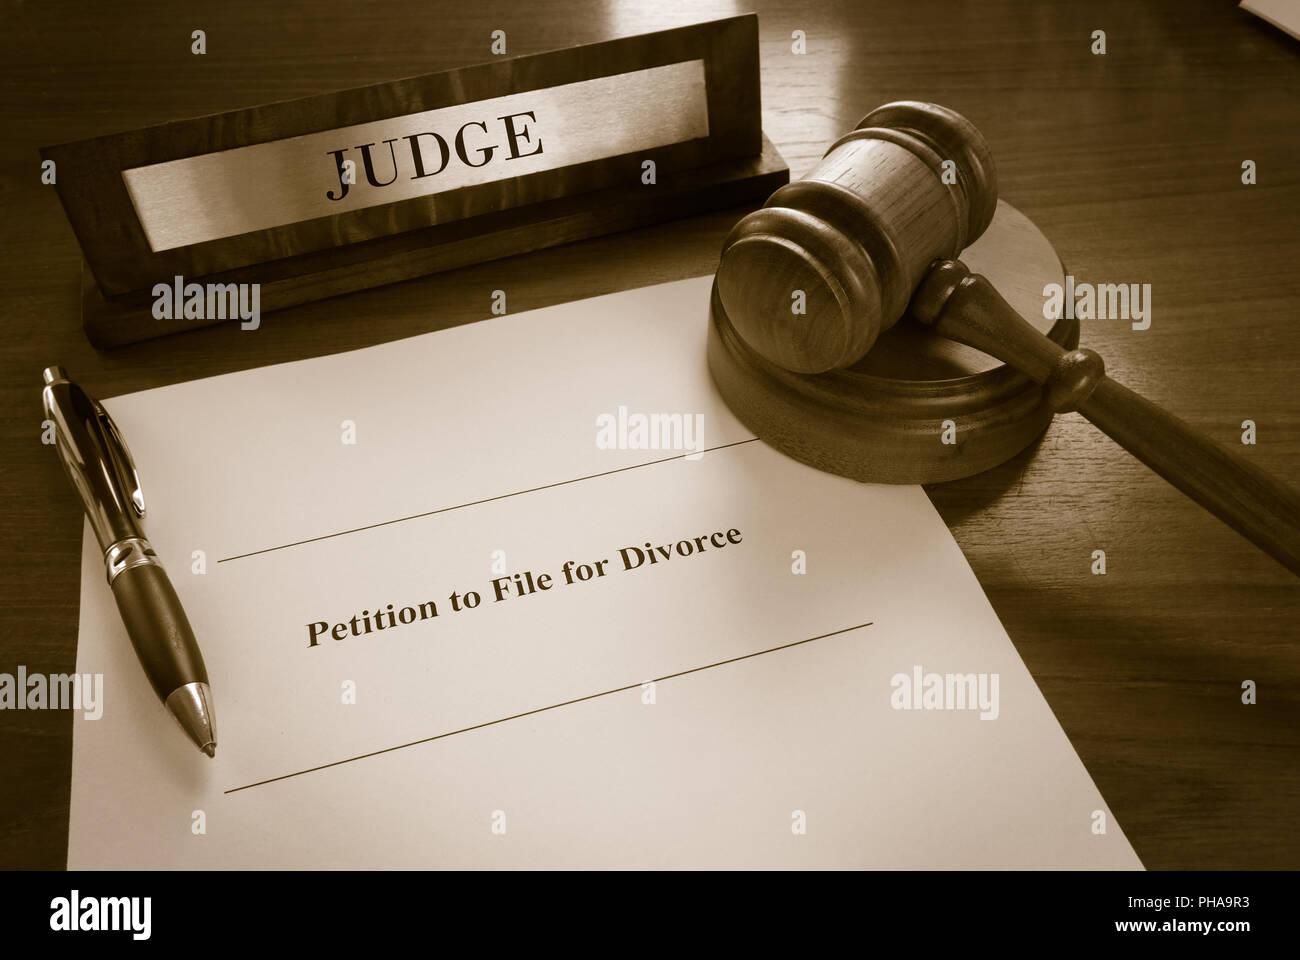 Divorce Petition - Stock Image